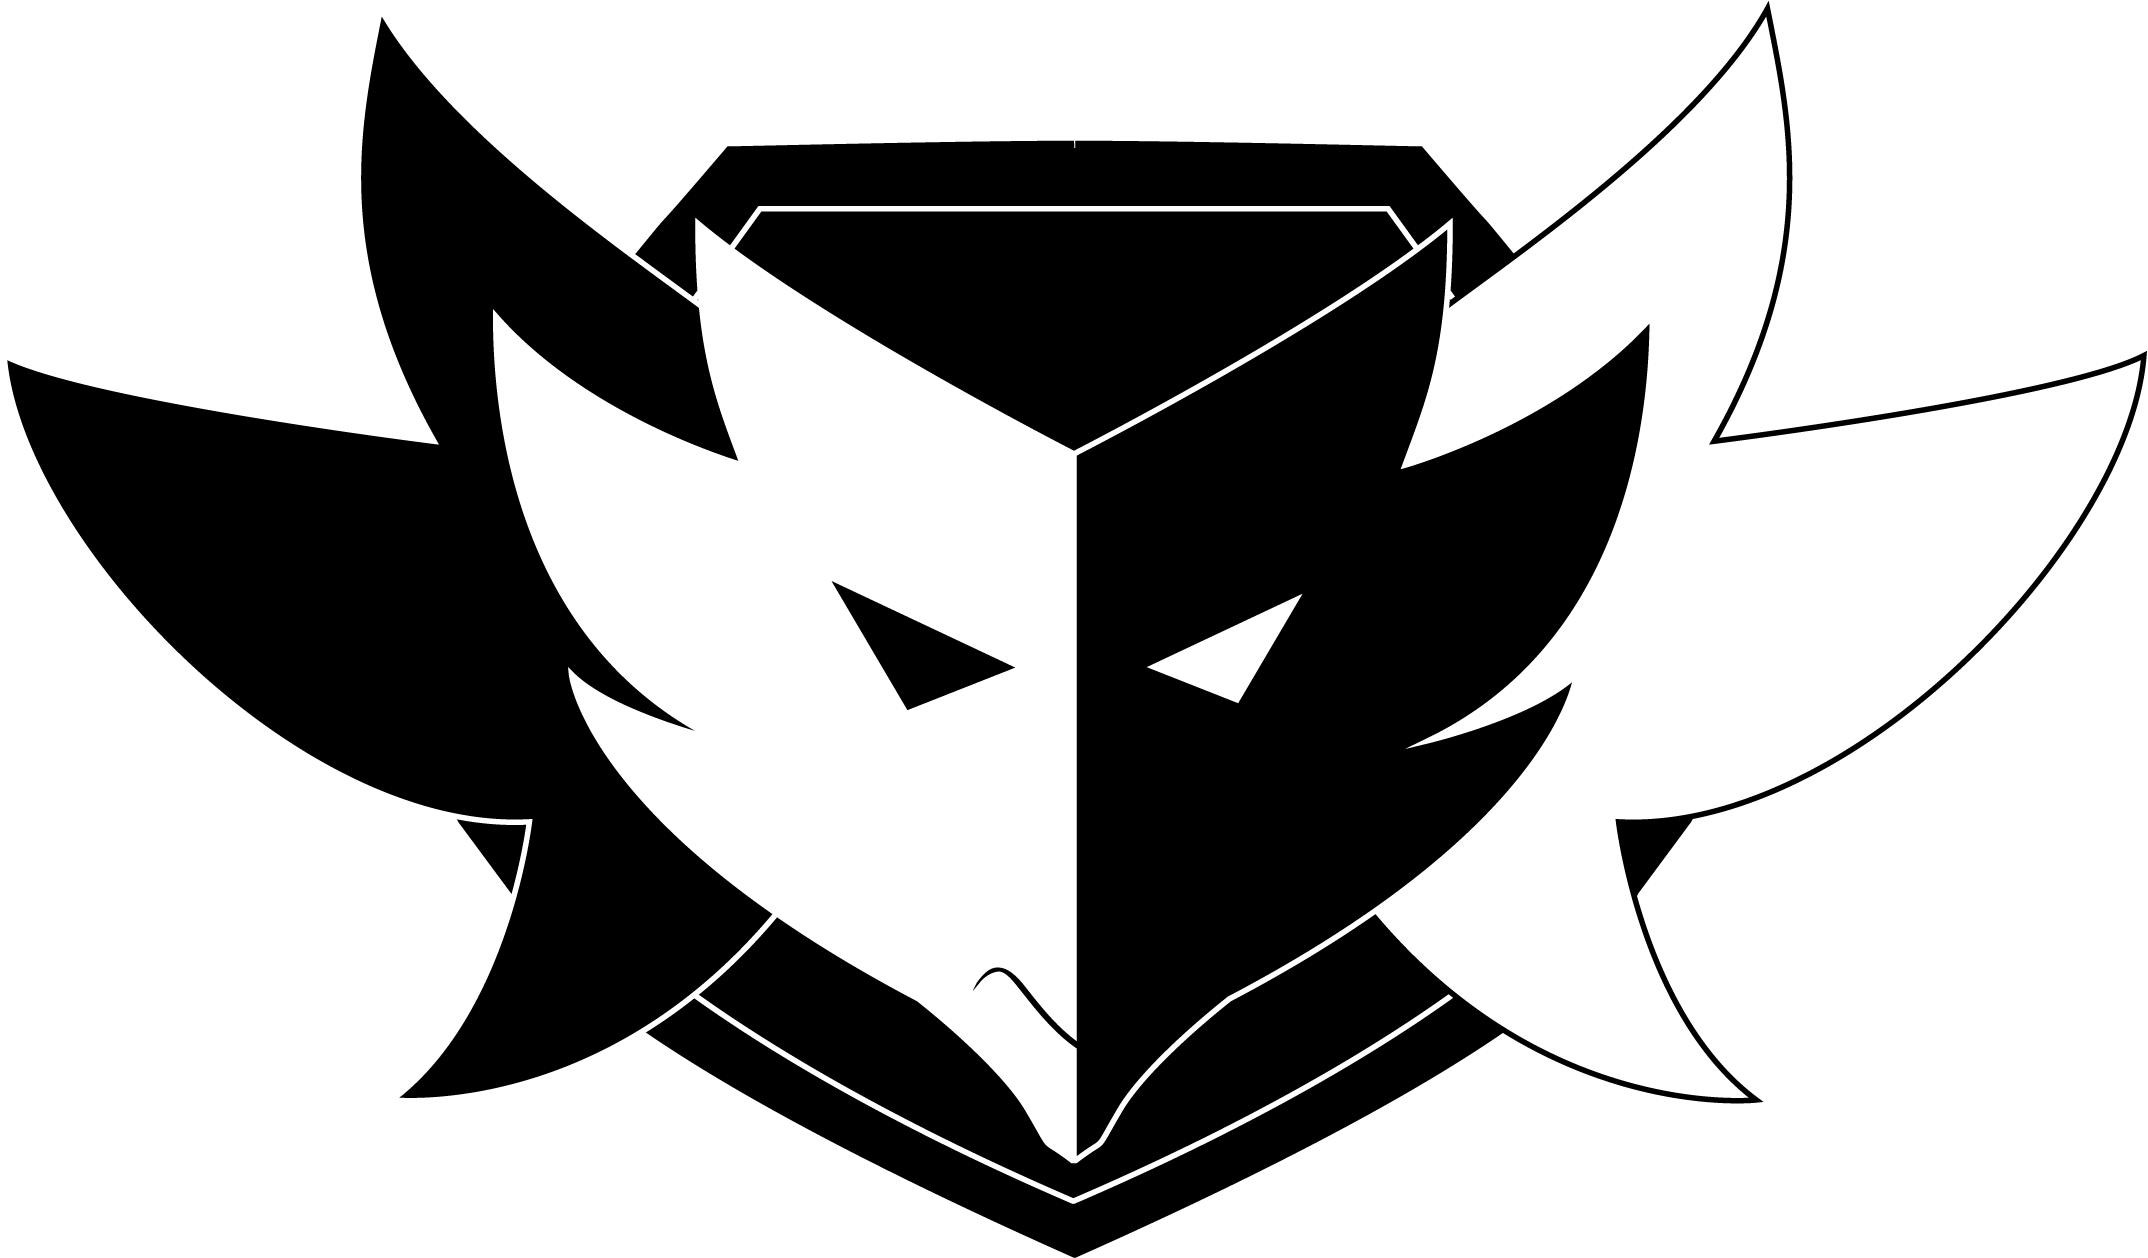 Zephyrs Emblem remake